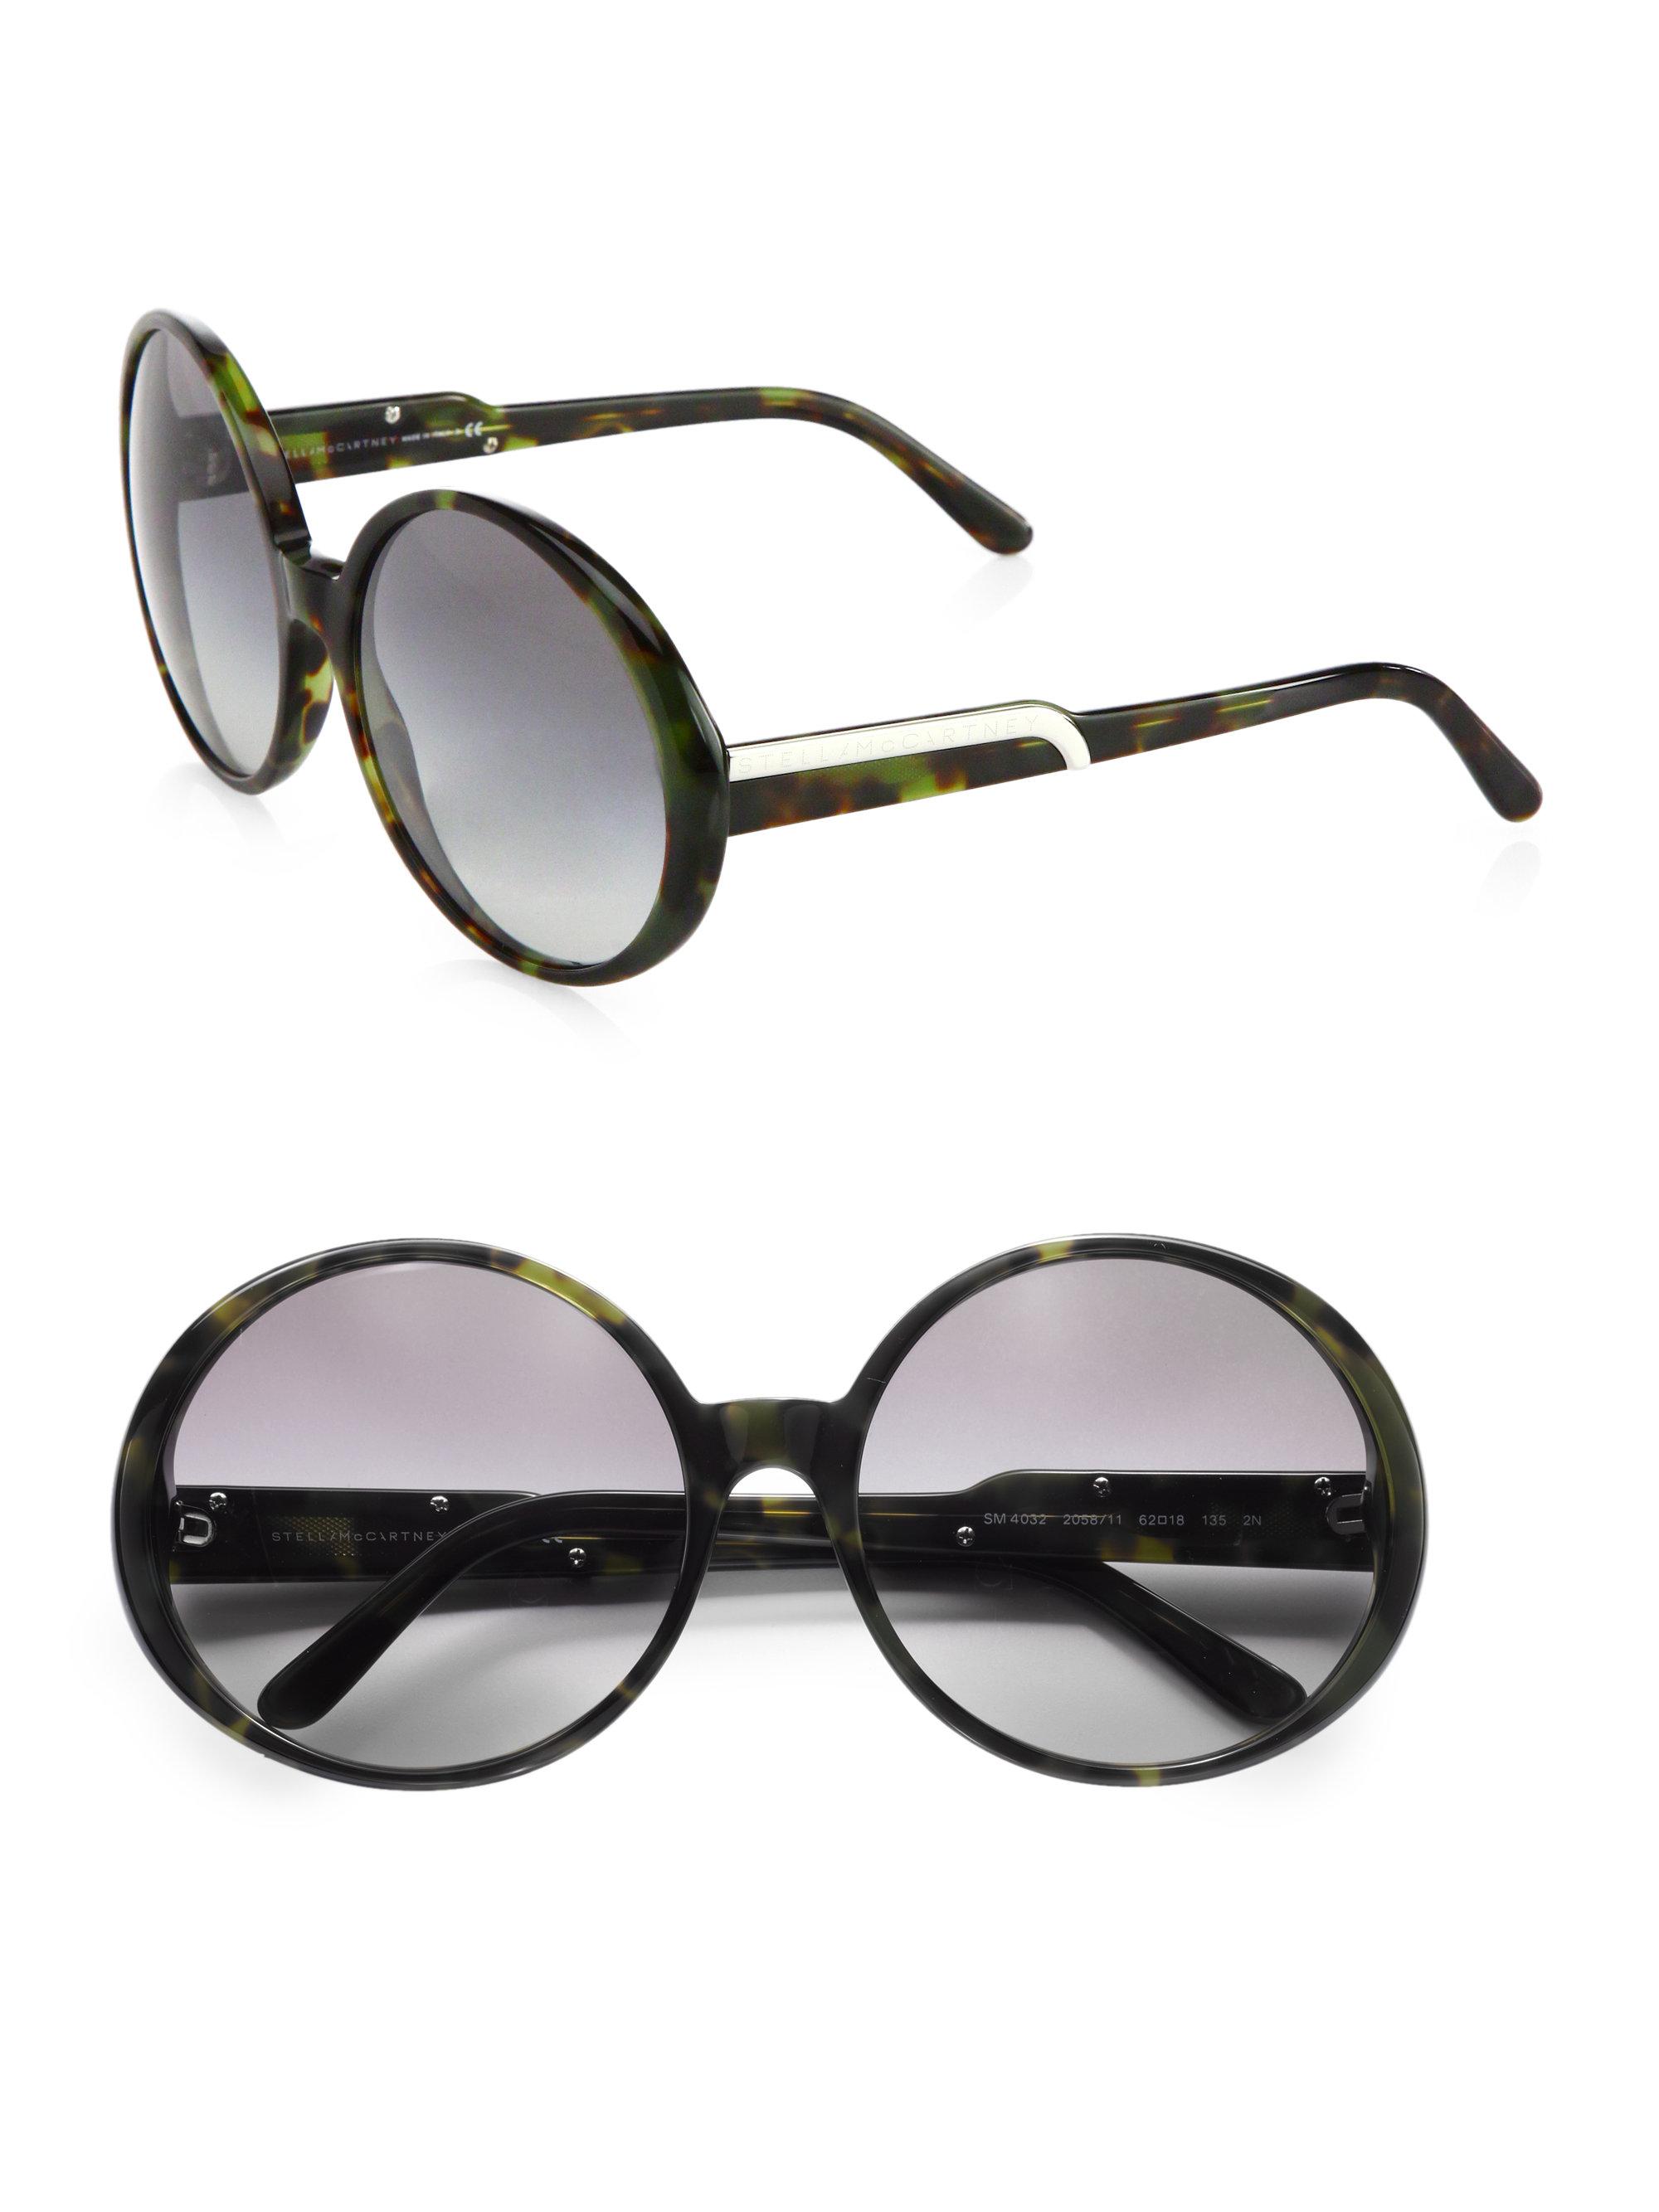 Stella McCartney Eyewear Round oversized sunglasses inTI9uShw